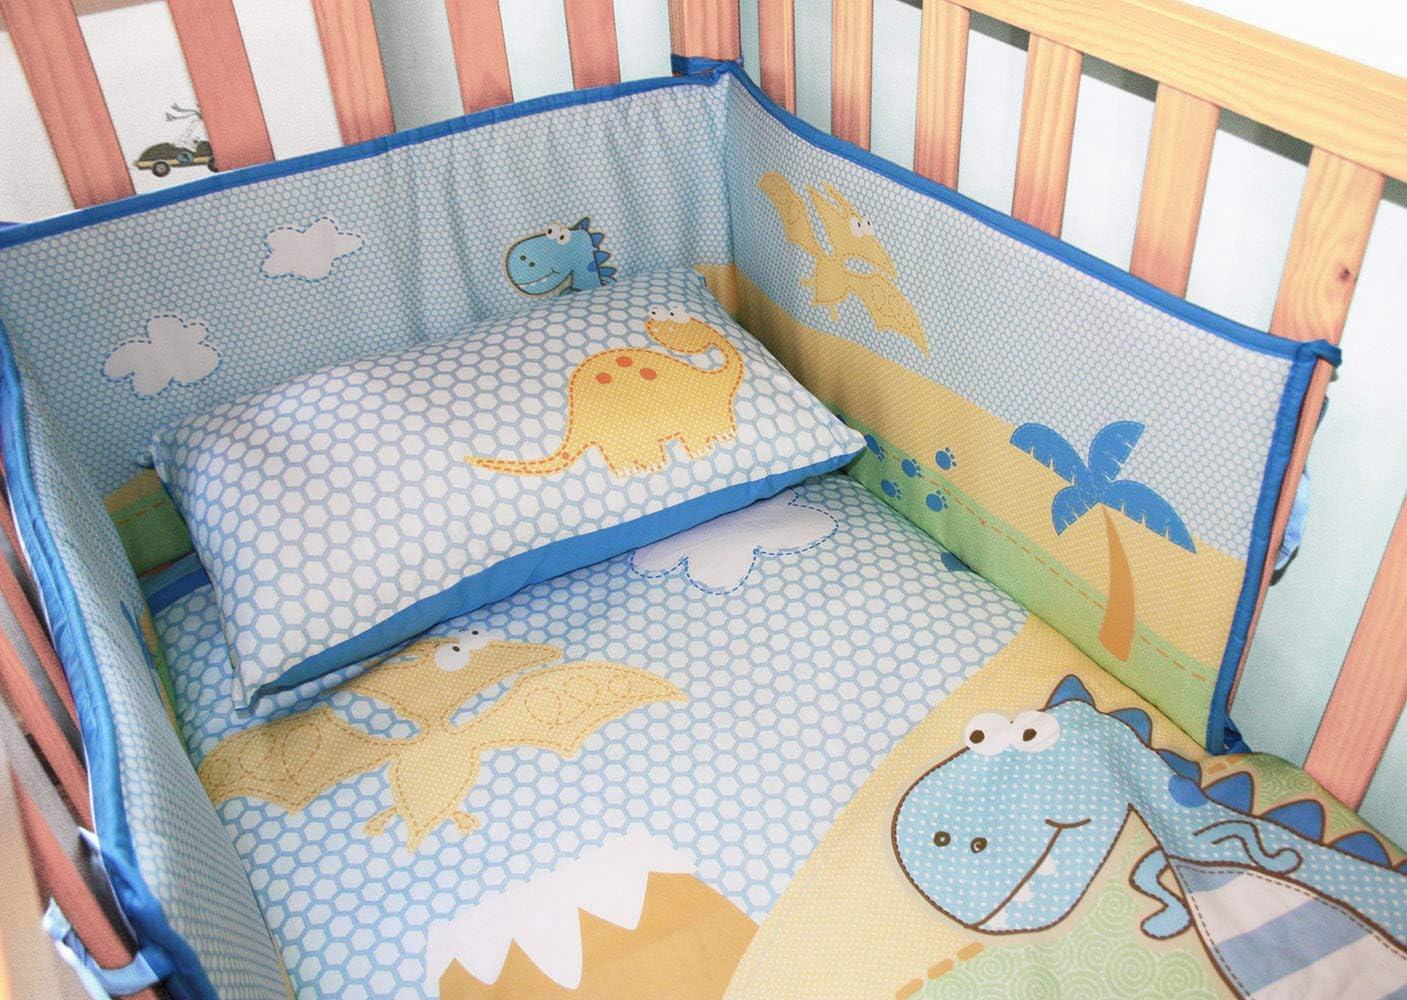 algod/ón acolchado protector para bordes 180 x 30 Gris ropa camas de beb/é protector de cuna 120x60 bebe chichoneras cuna 60x120 chichonera cuna